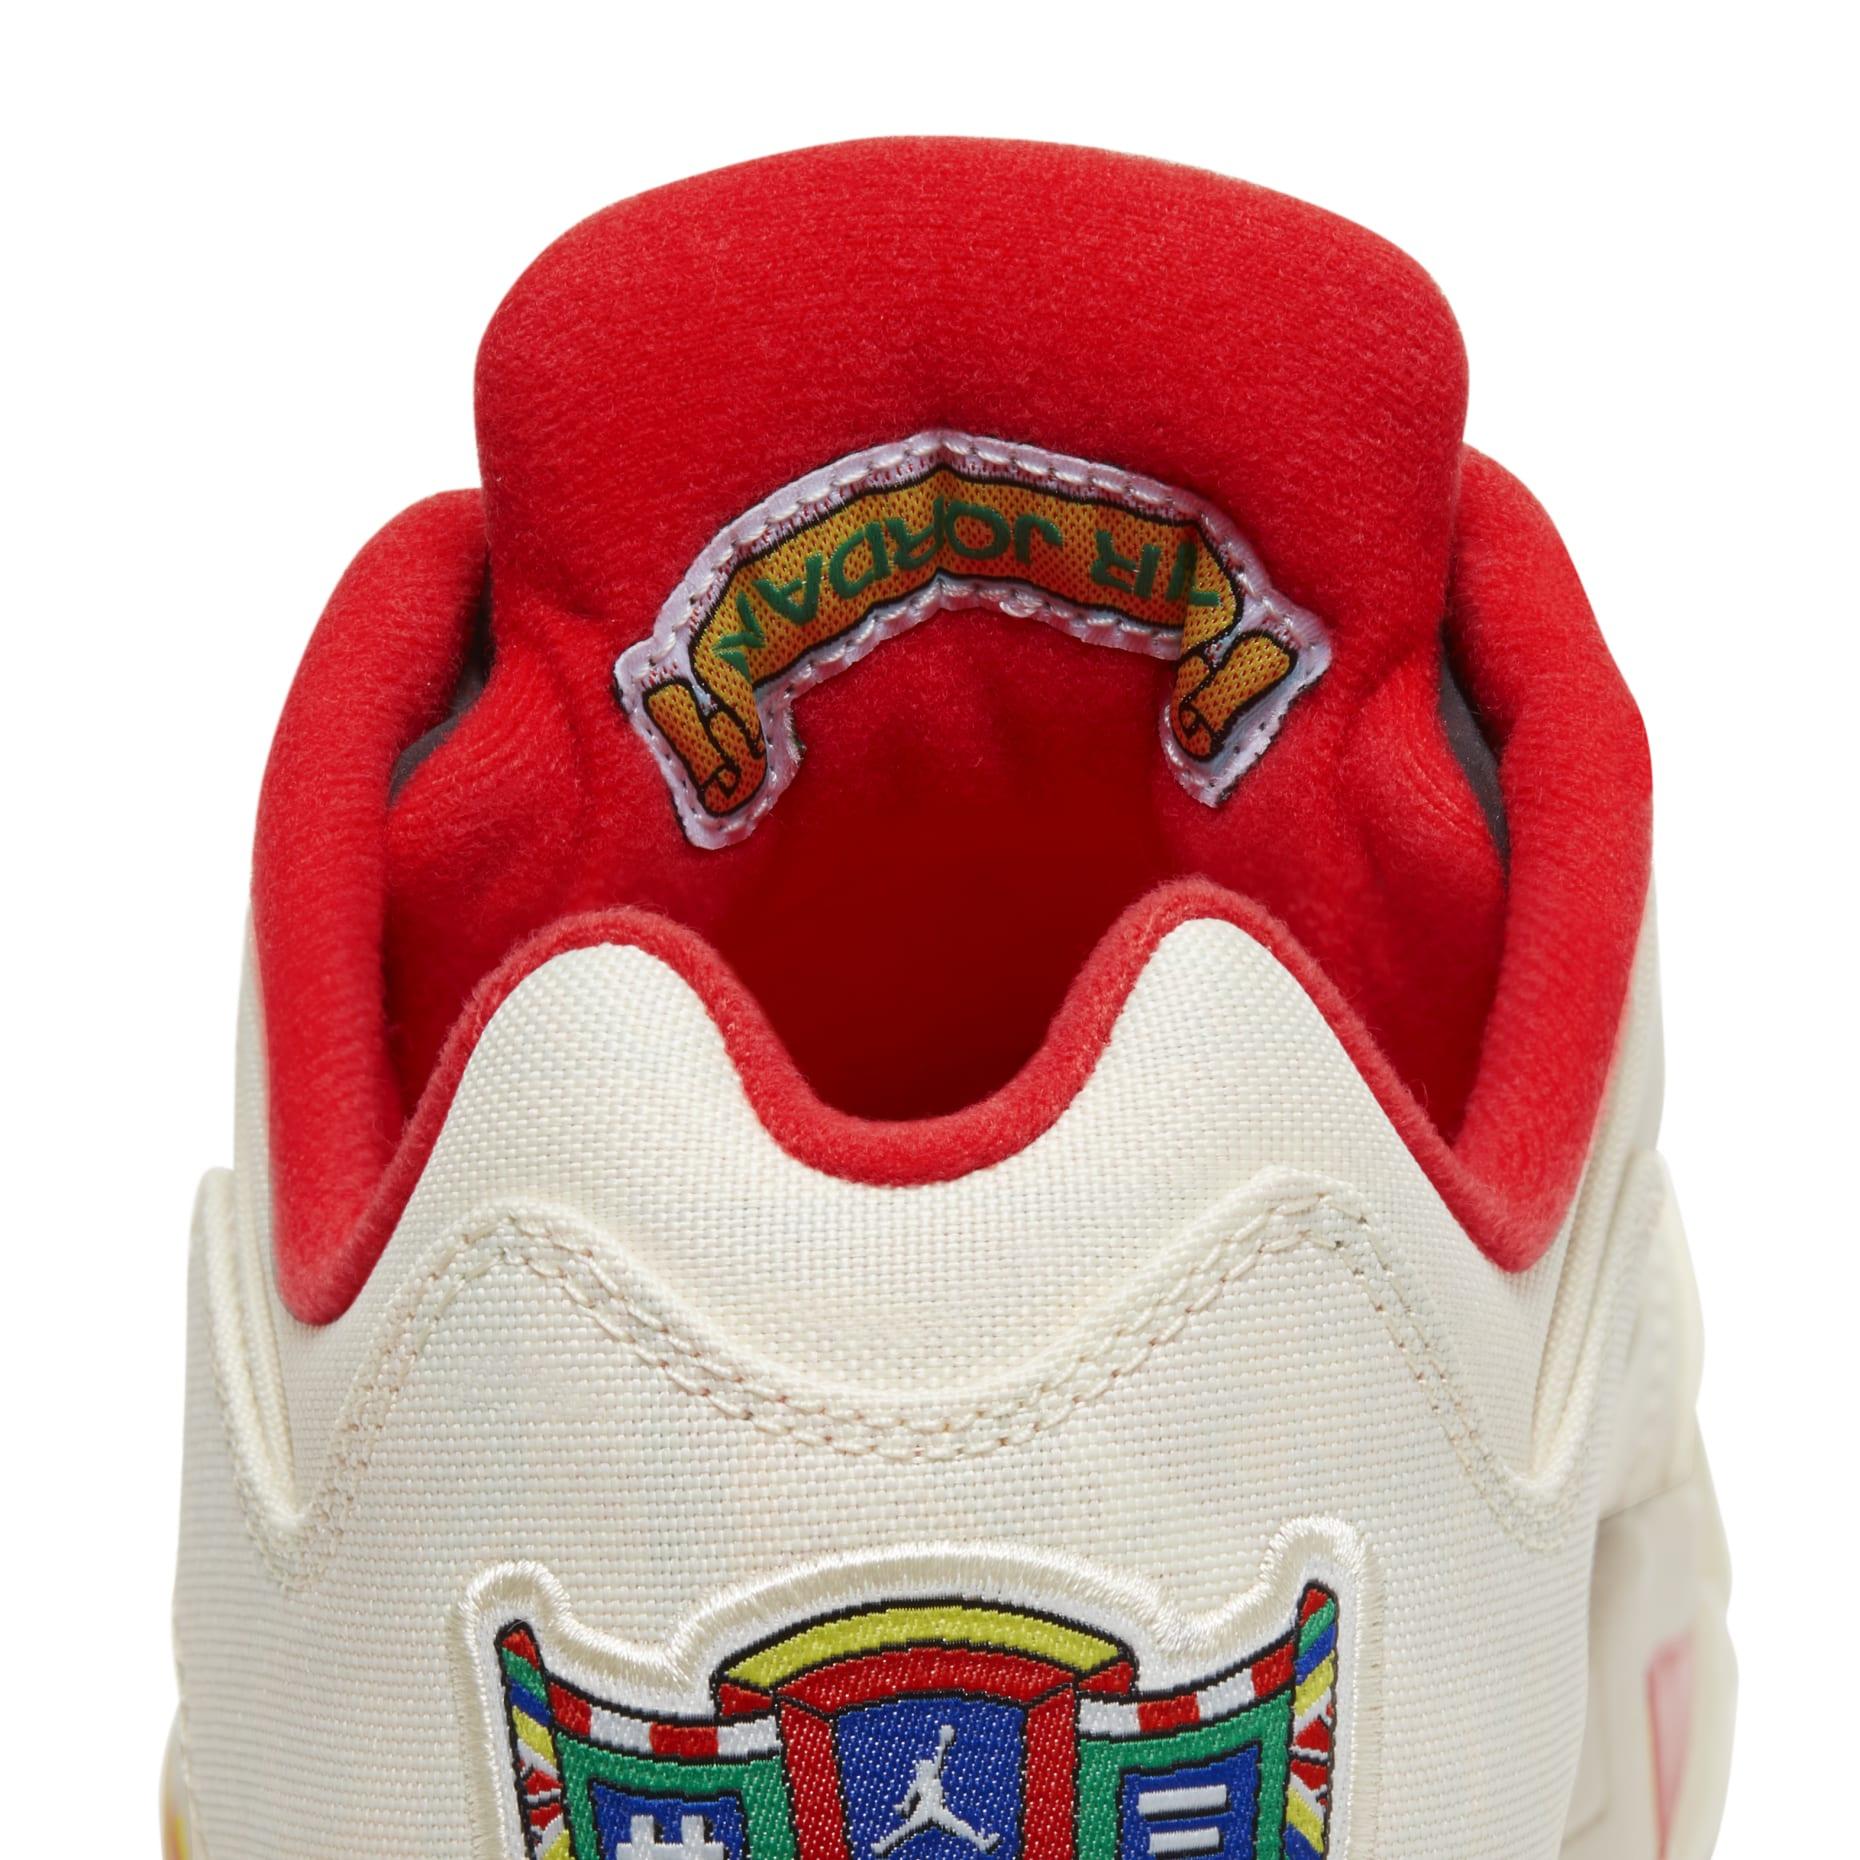 Air Jordan 5 Retro Low 'Chinese New Year' DD2240-100 Heel